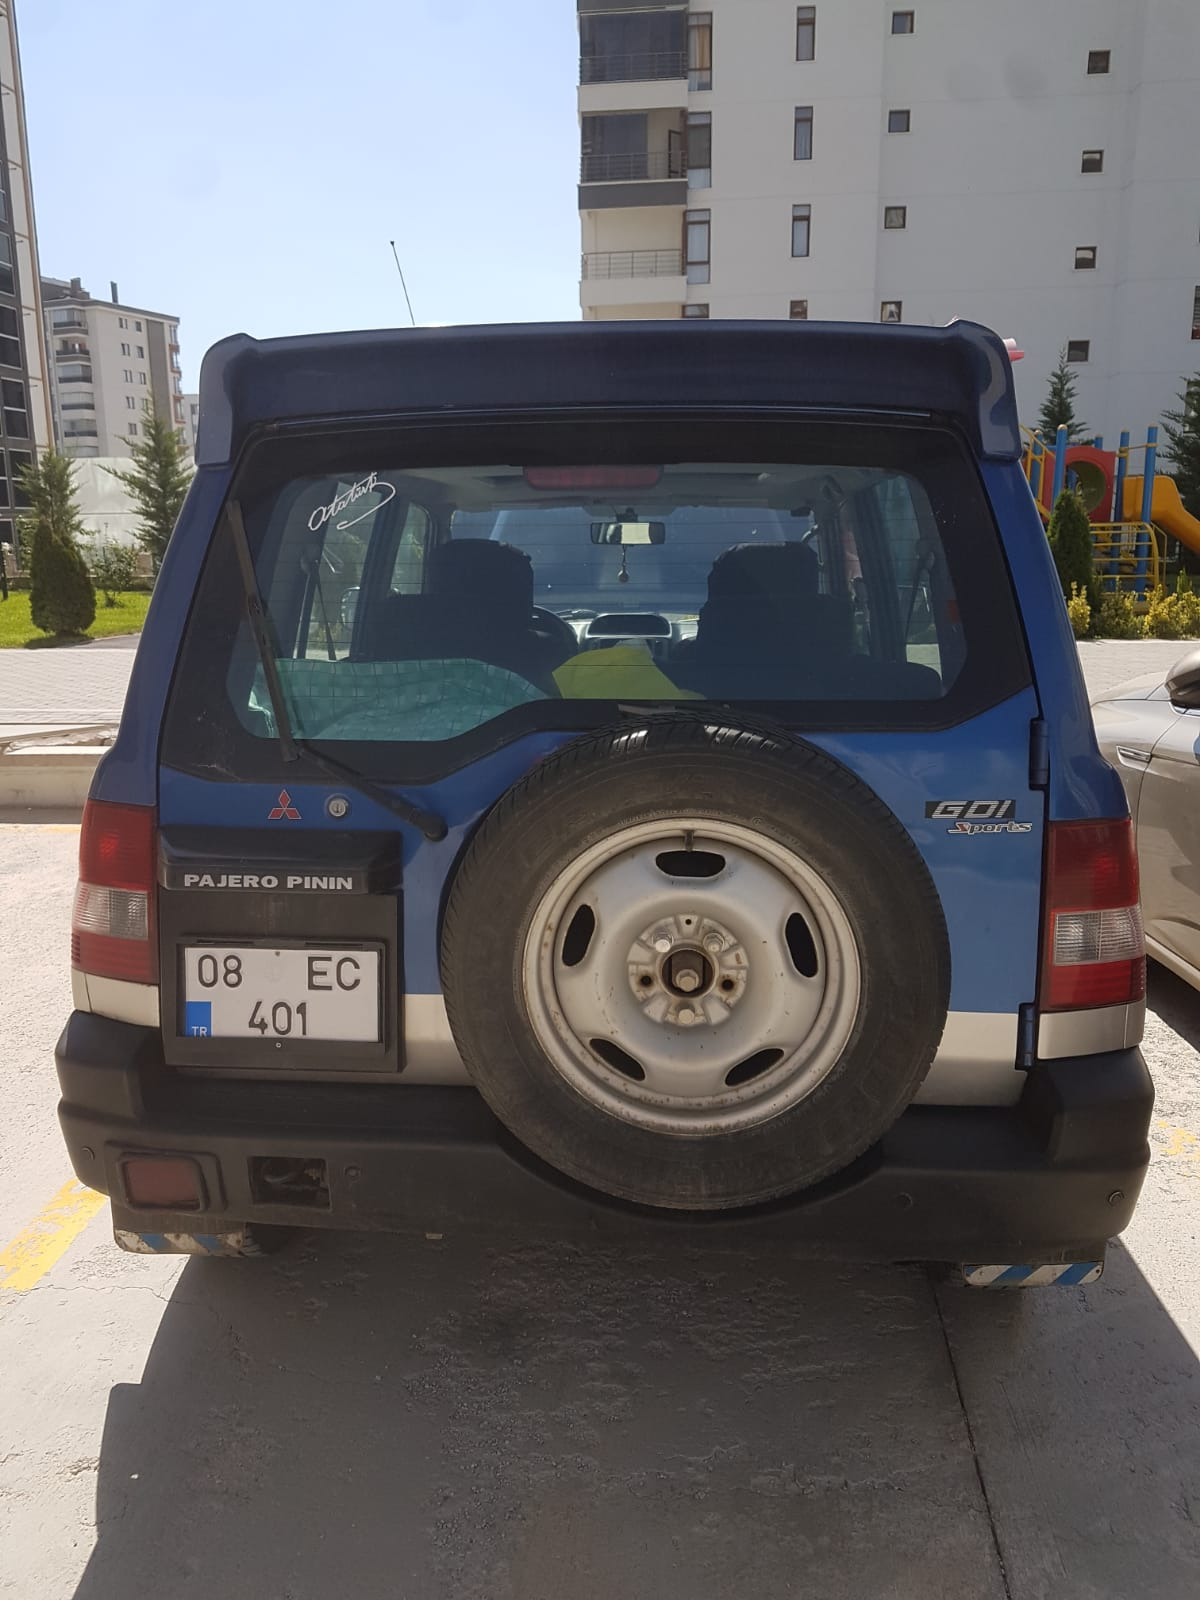 ÇEKİ DEMİRİ TAKMA MONTESİ ANKARA 098